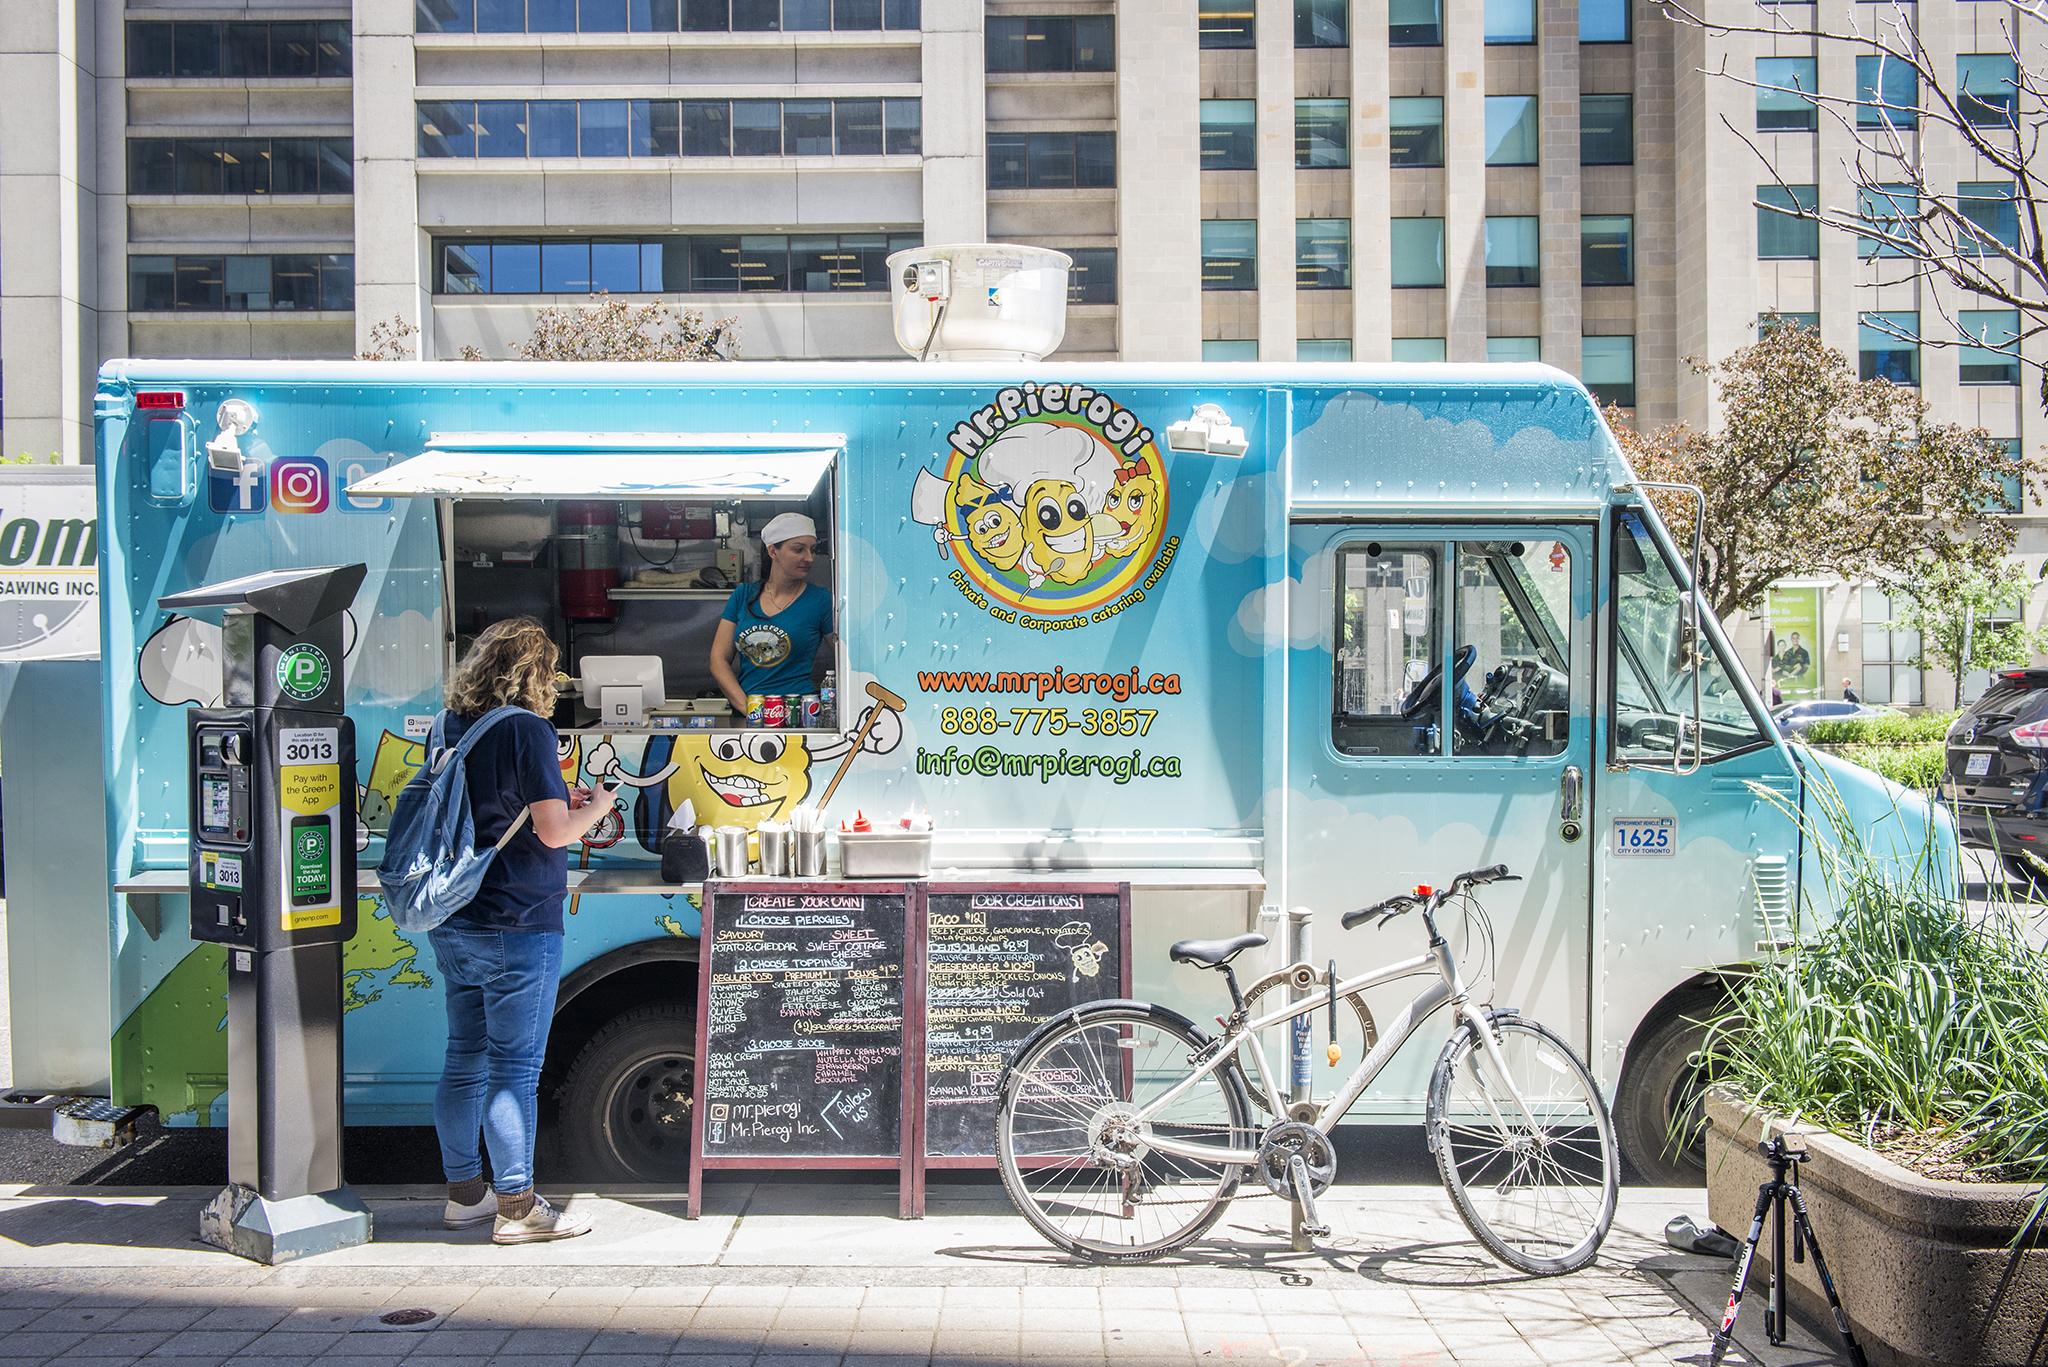 Pierogi Food Truck Toronto